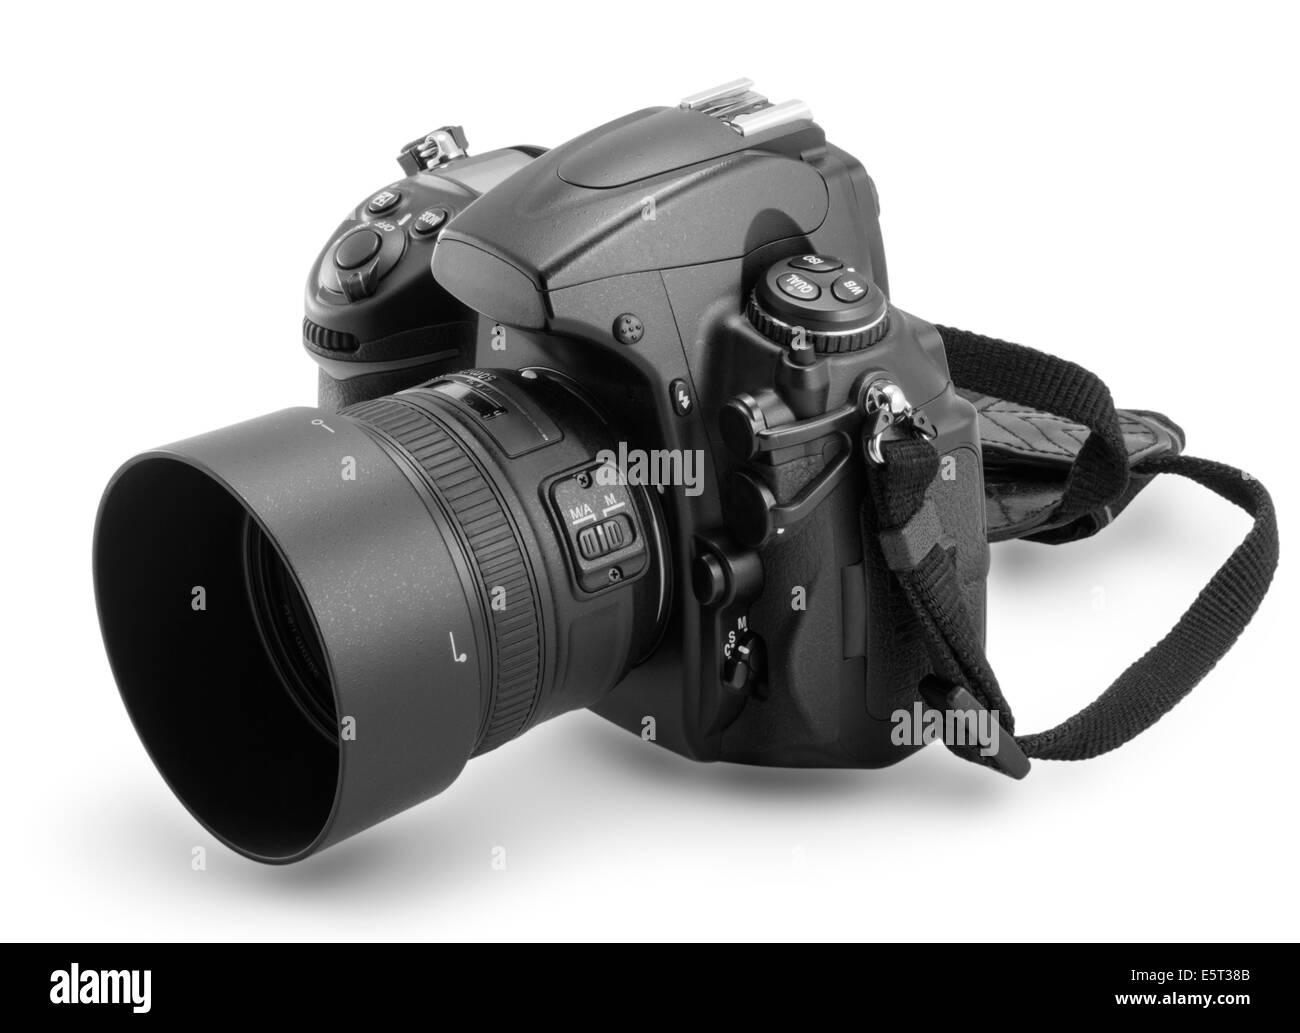 Digital 35mm camera - Stock Image